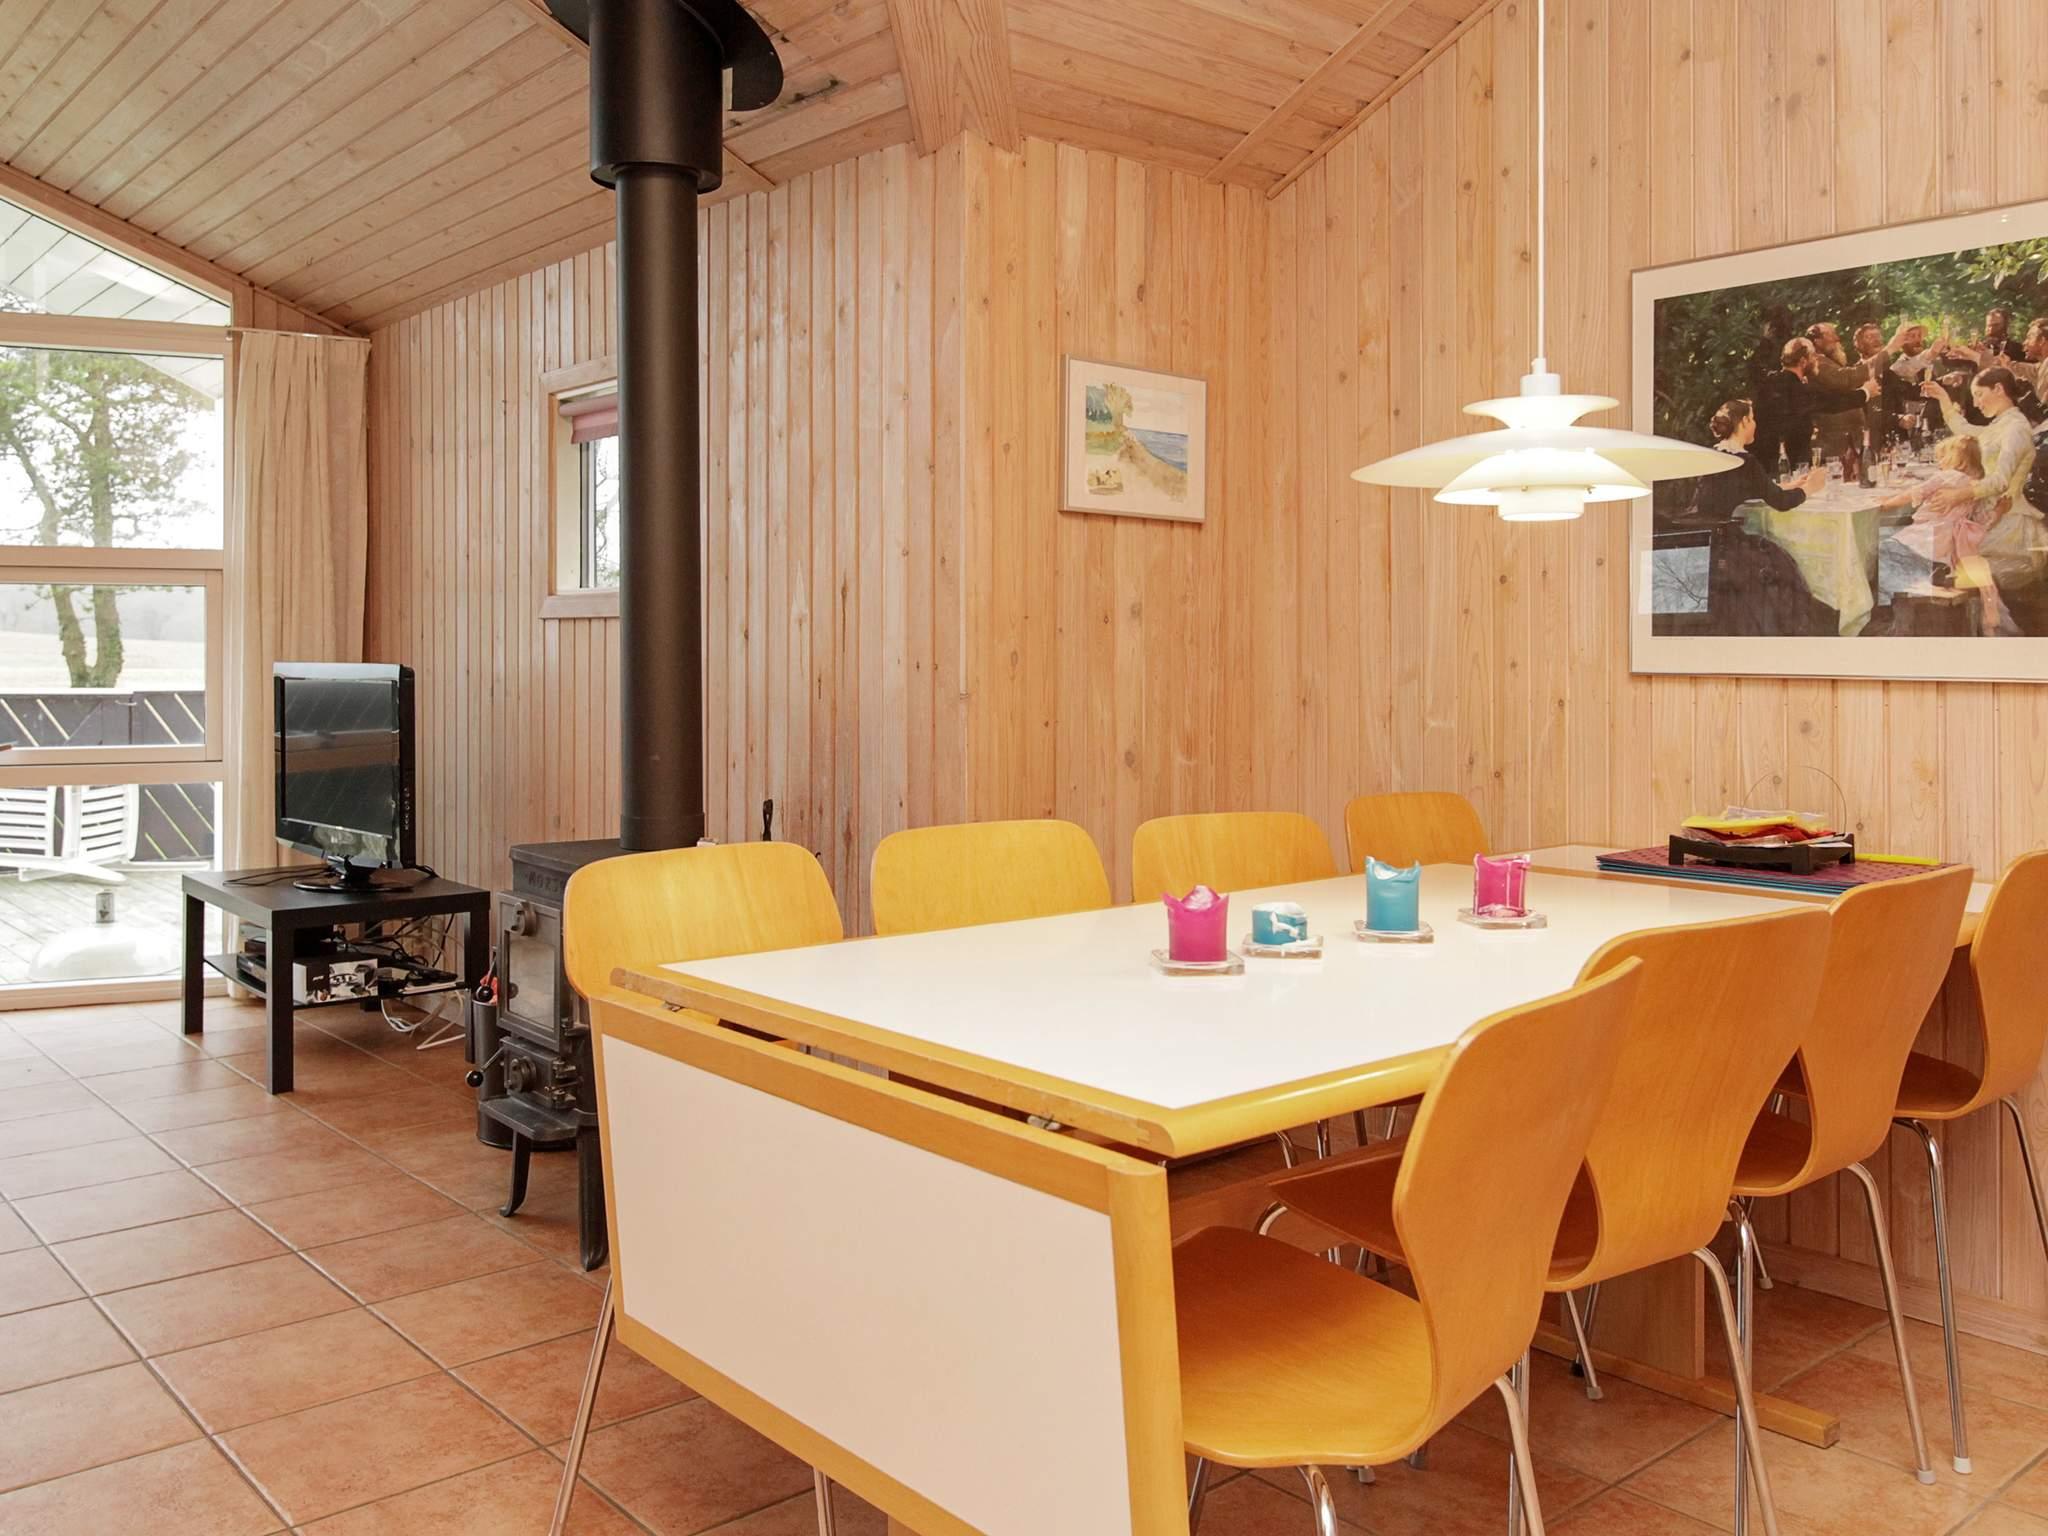 Ferienhaus Fredmosen (596960), Humble, , Langeland, Dänemark, Bild 5